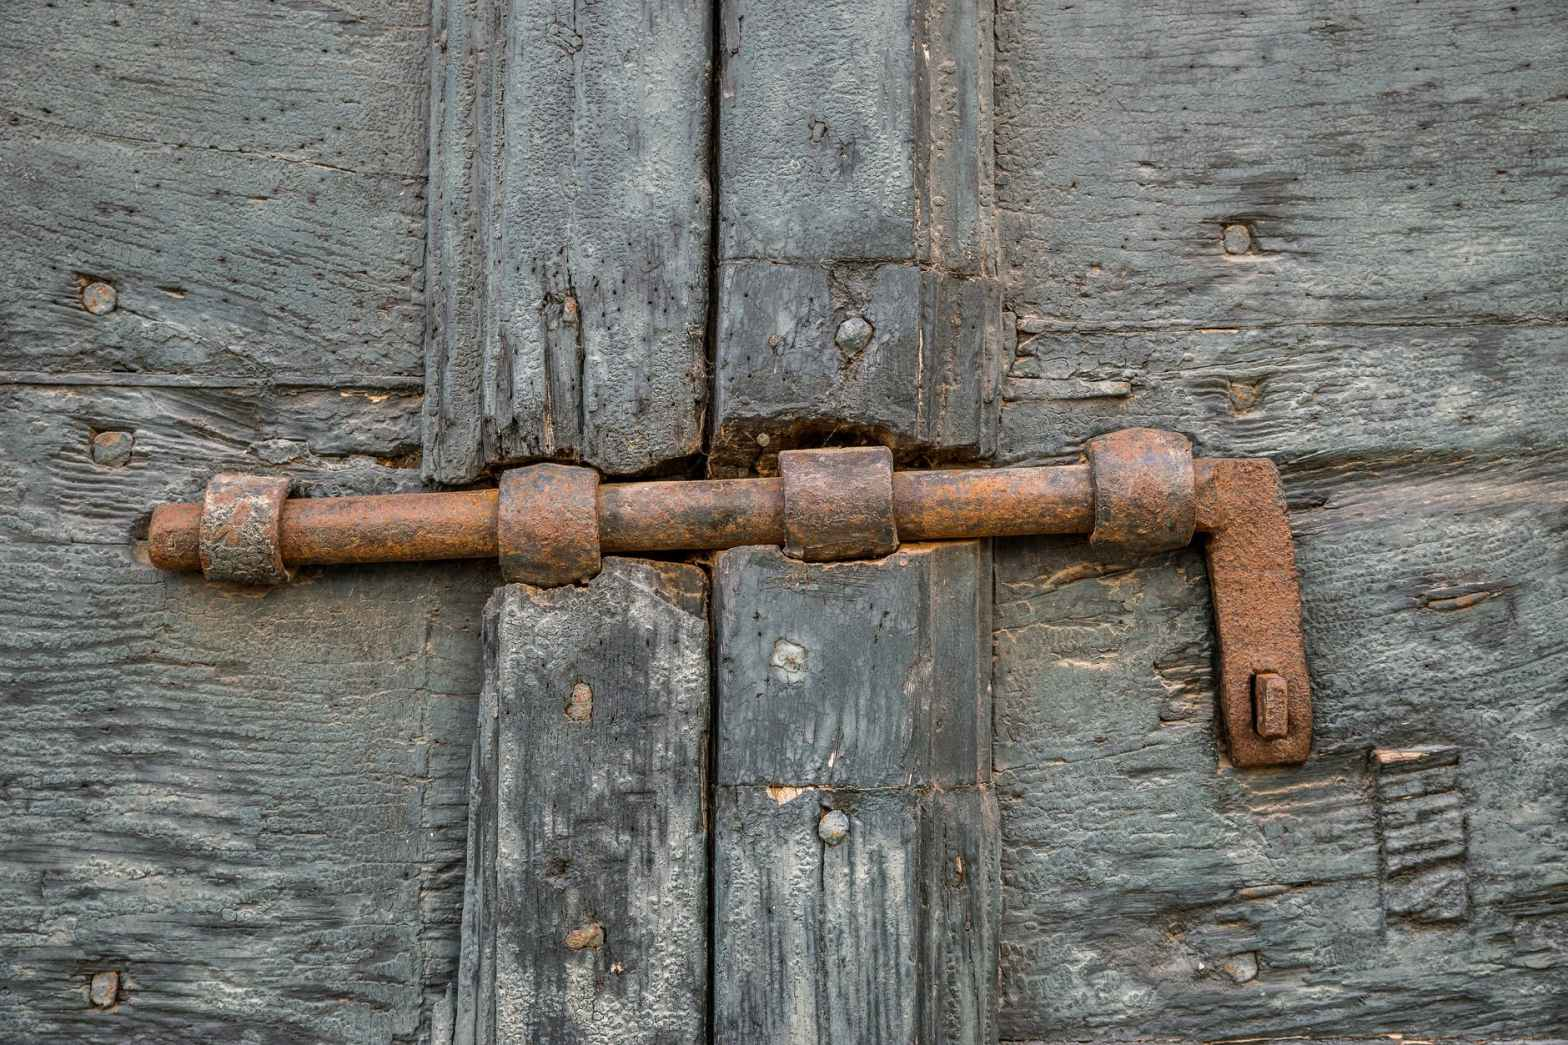 a brown rusty metal handle